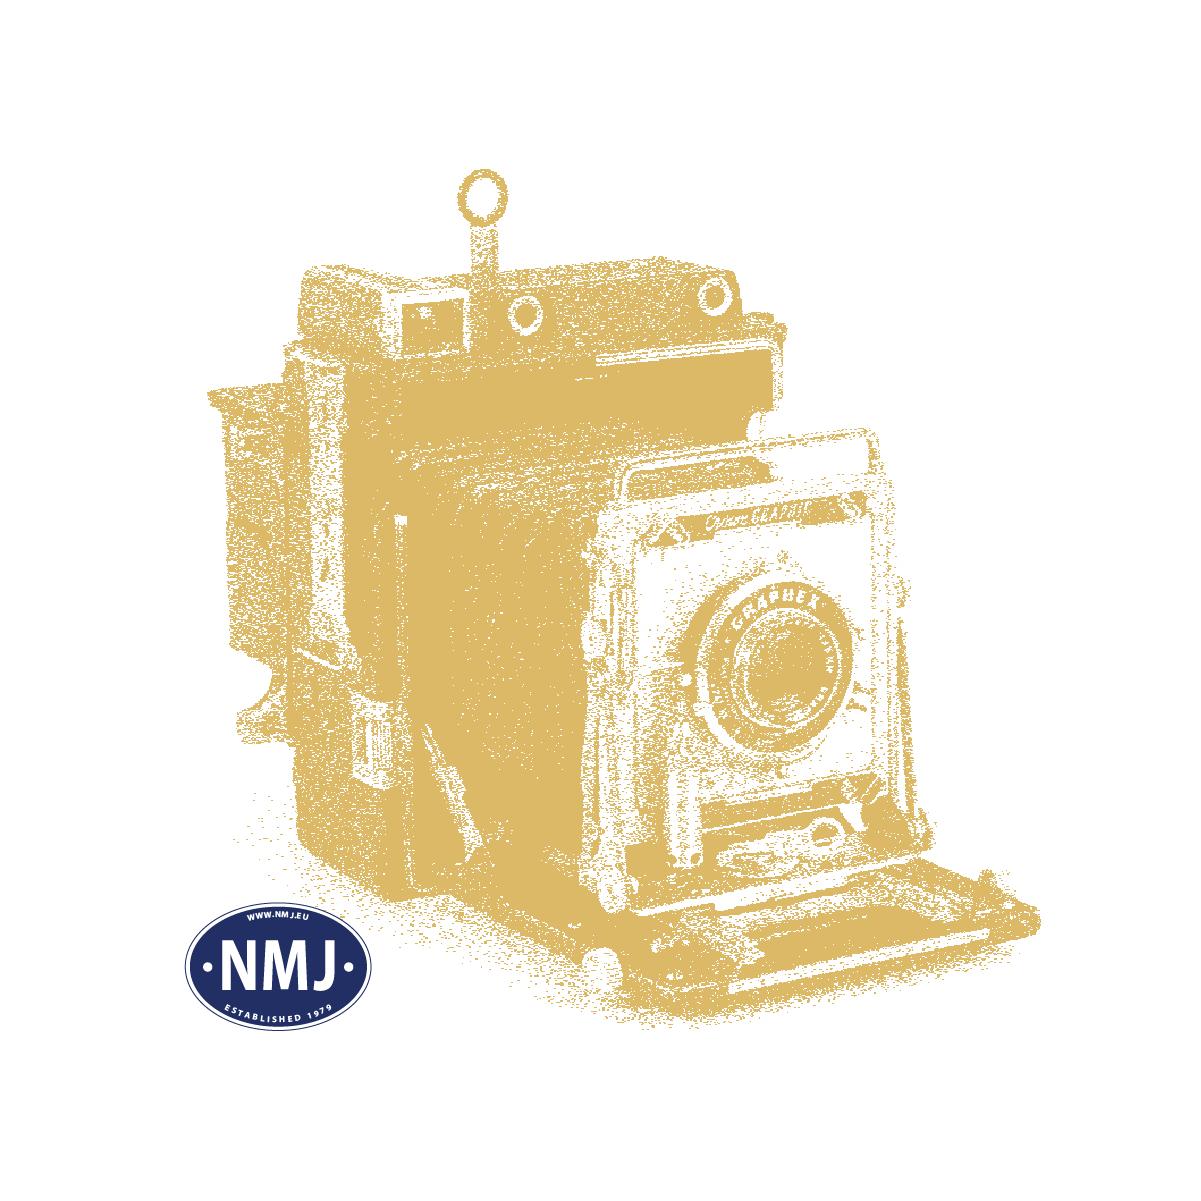 MBR51-4103 - Larch Sommer, 6-10 cm ,N